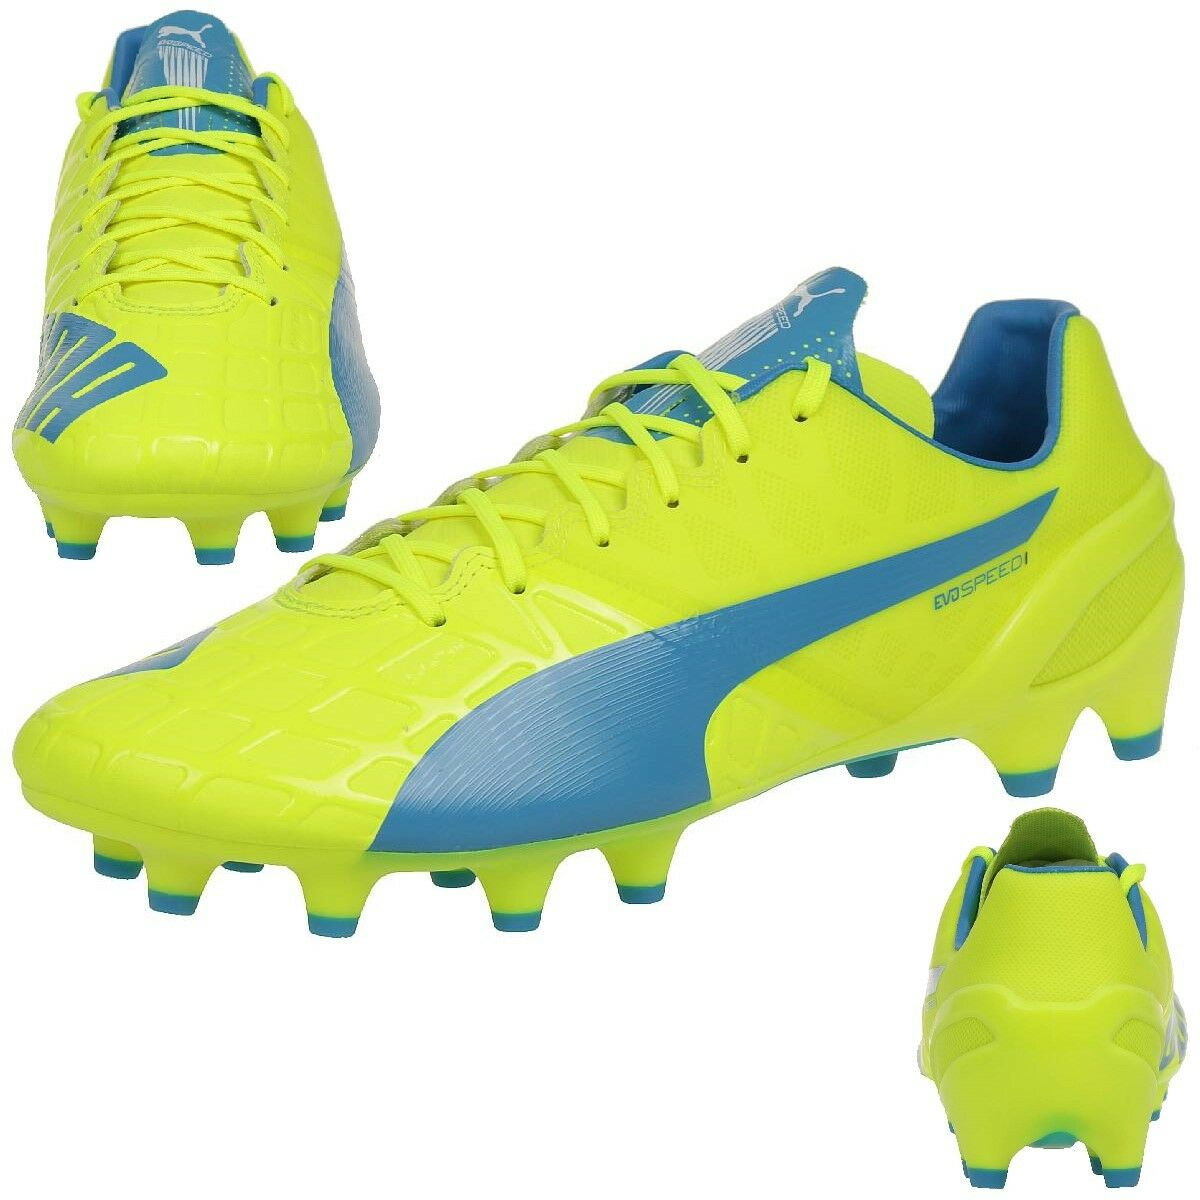 Puma Football Boots Evospeed 1.4 Fg Football Men's 103264 04 Yellow